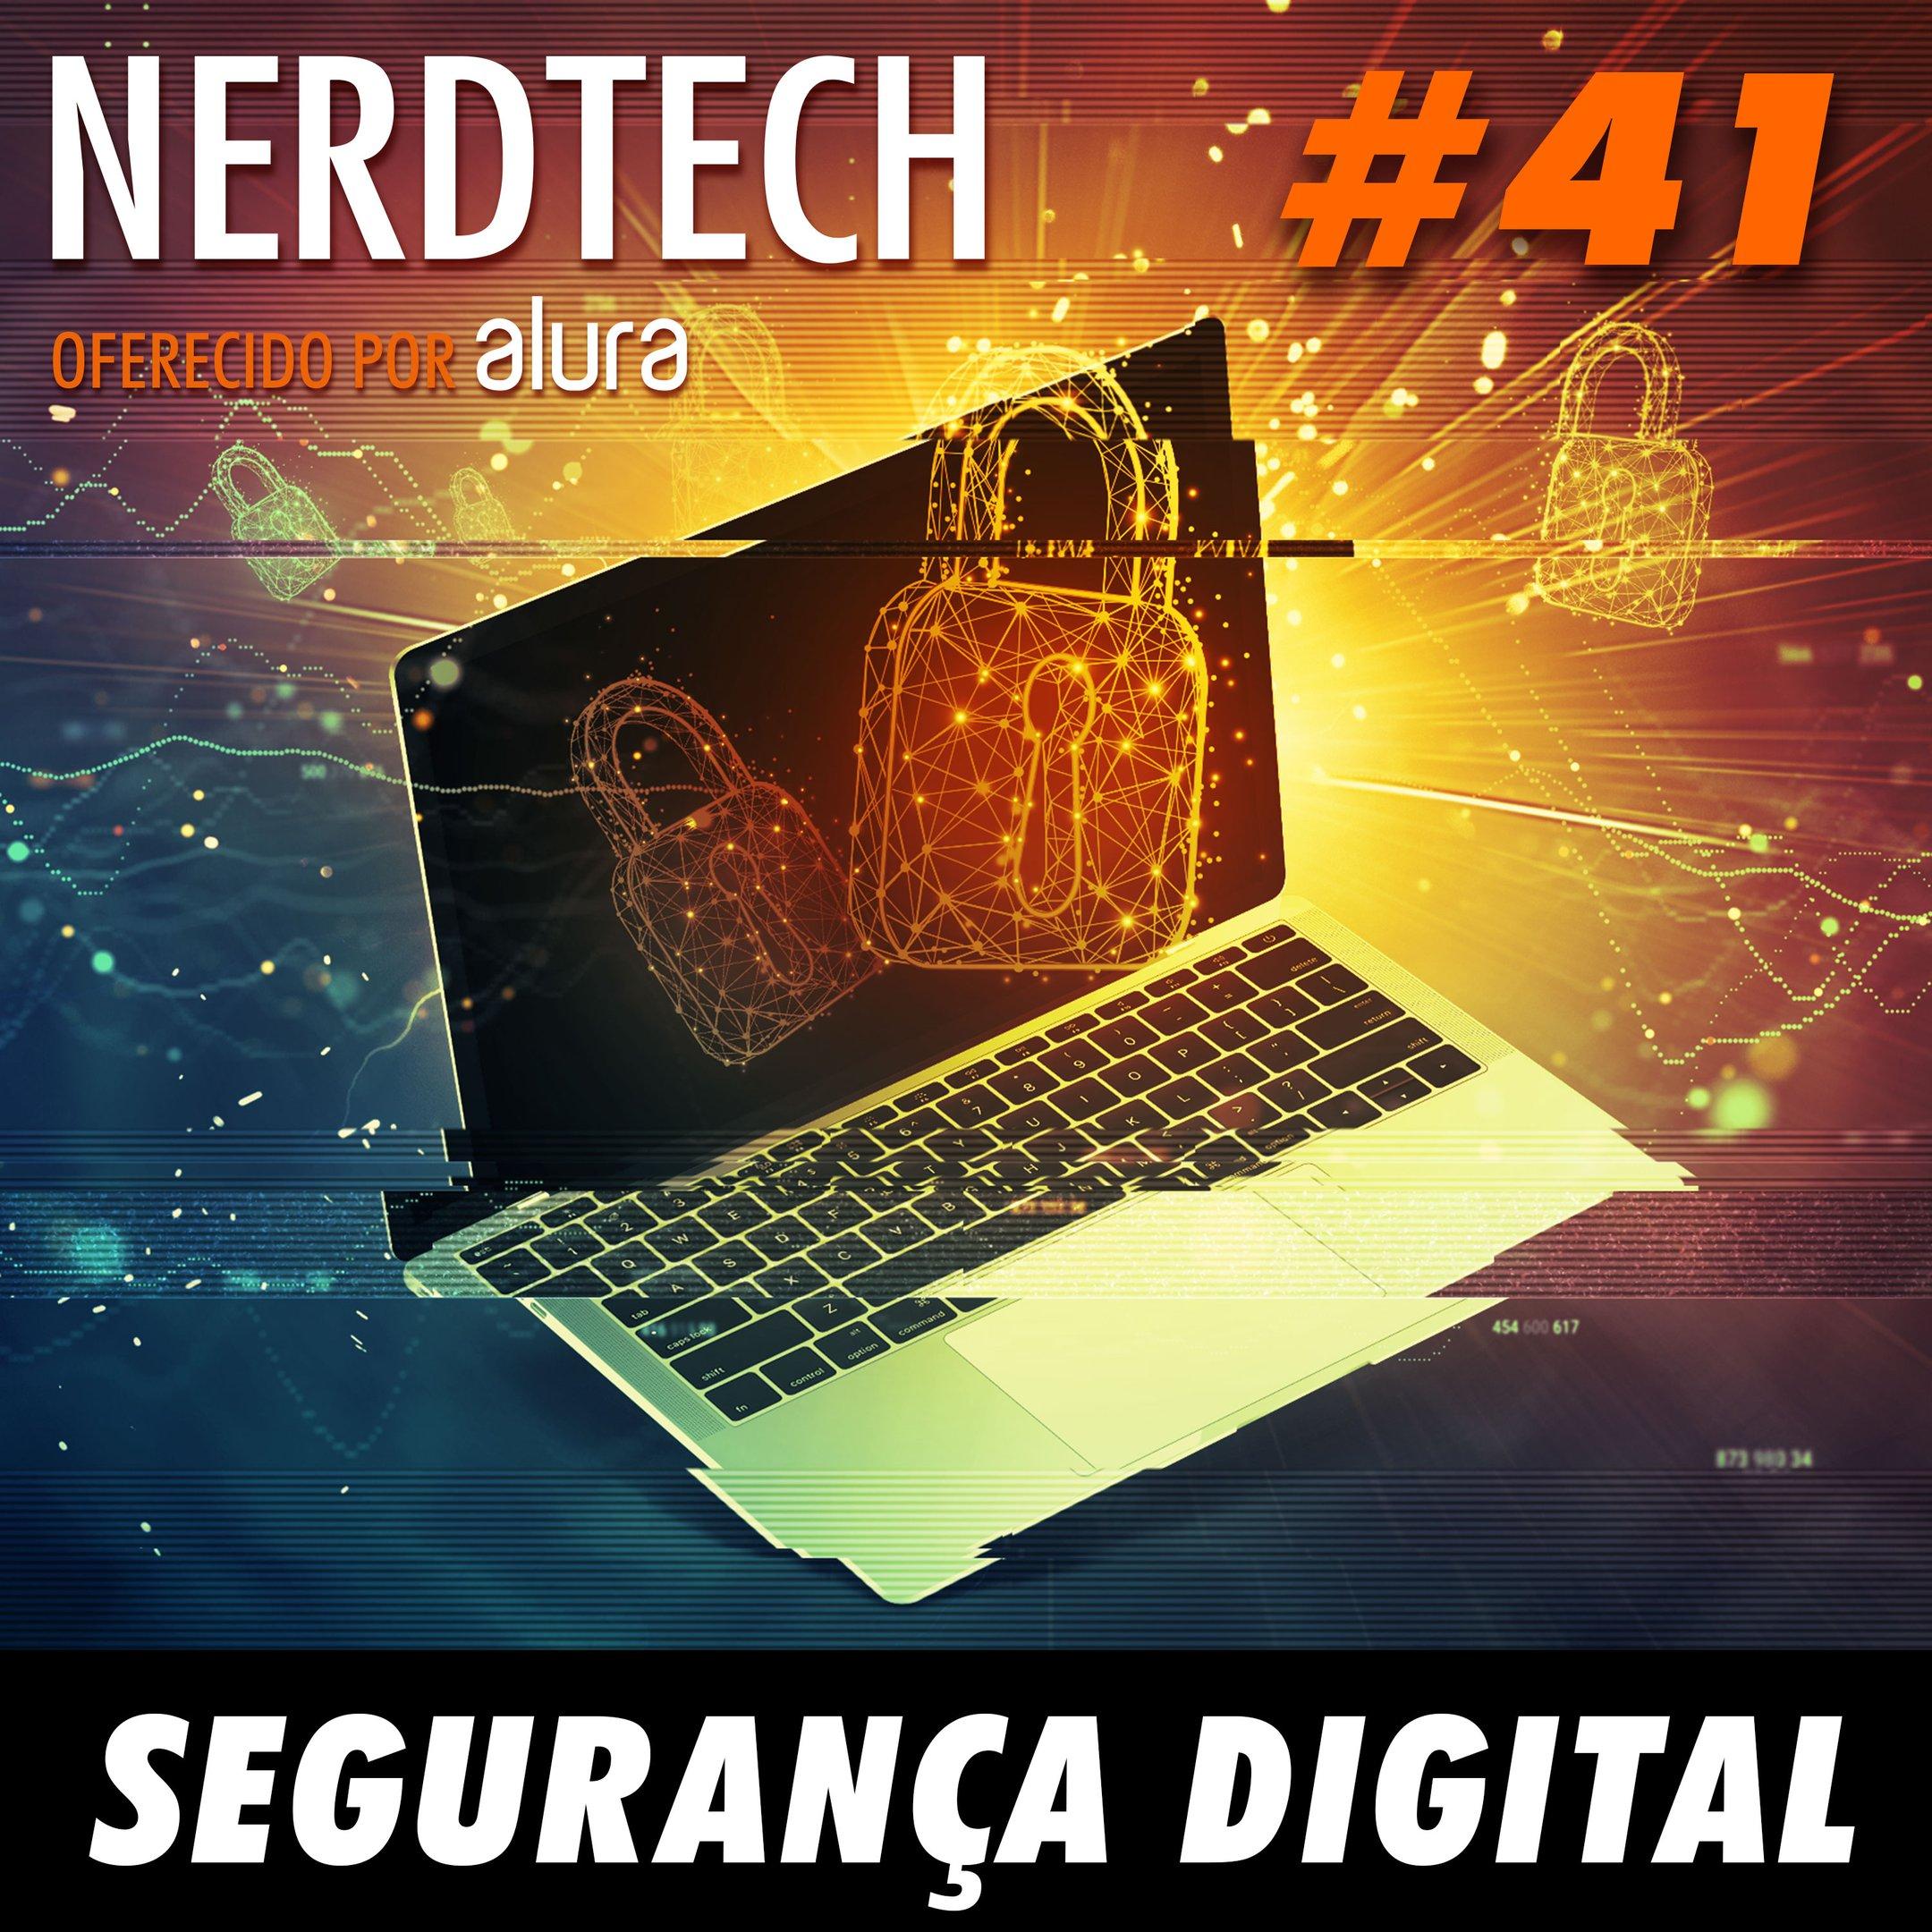 NerdTech 41 - Segurança Digital